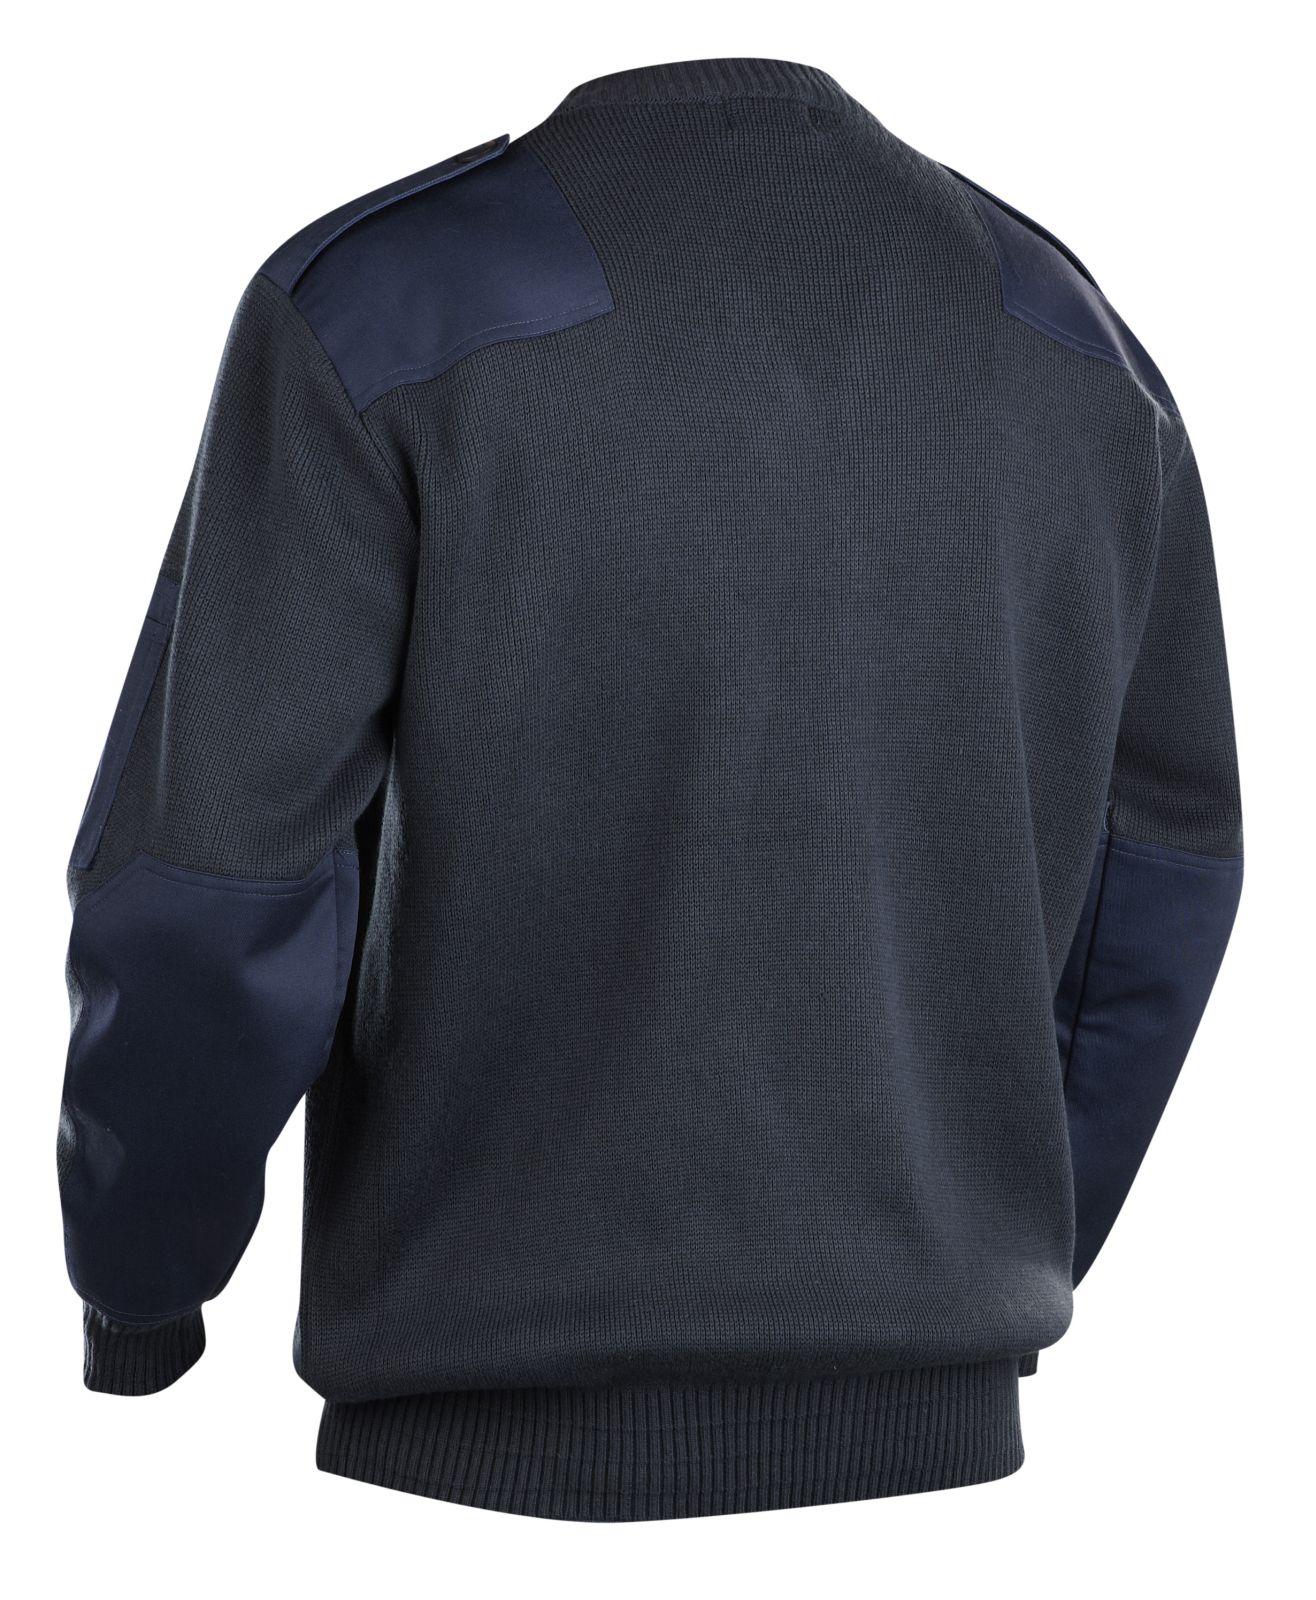 Blaklader Pullovers 83992905 marineblauw(8800)